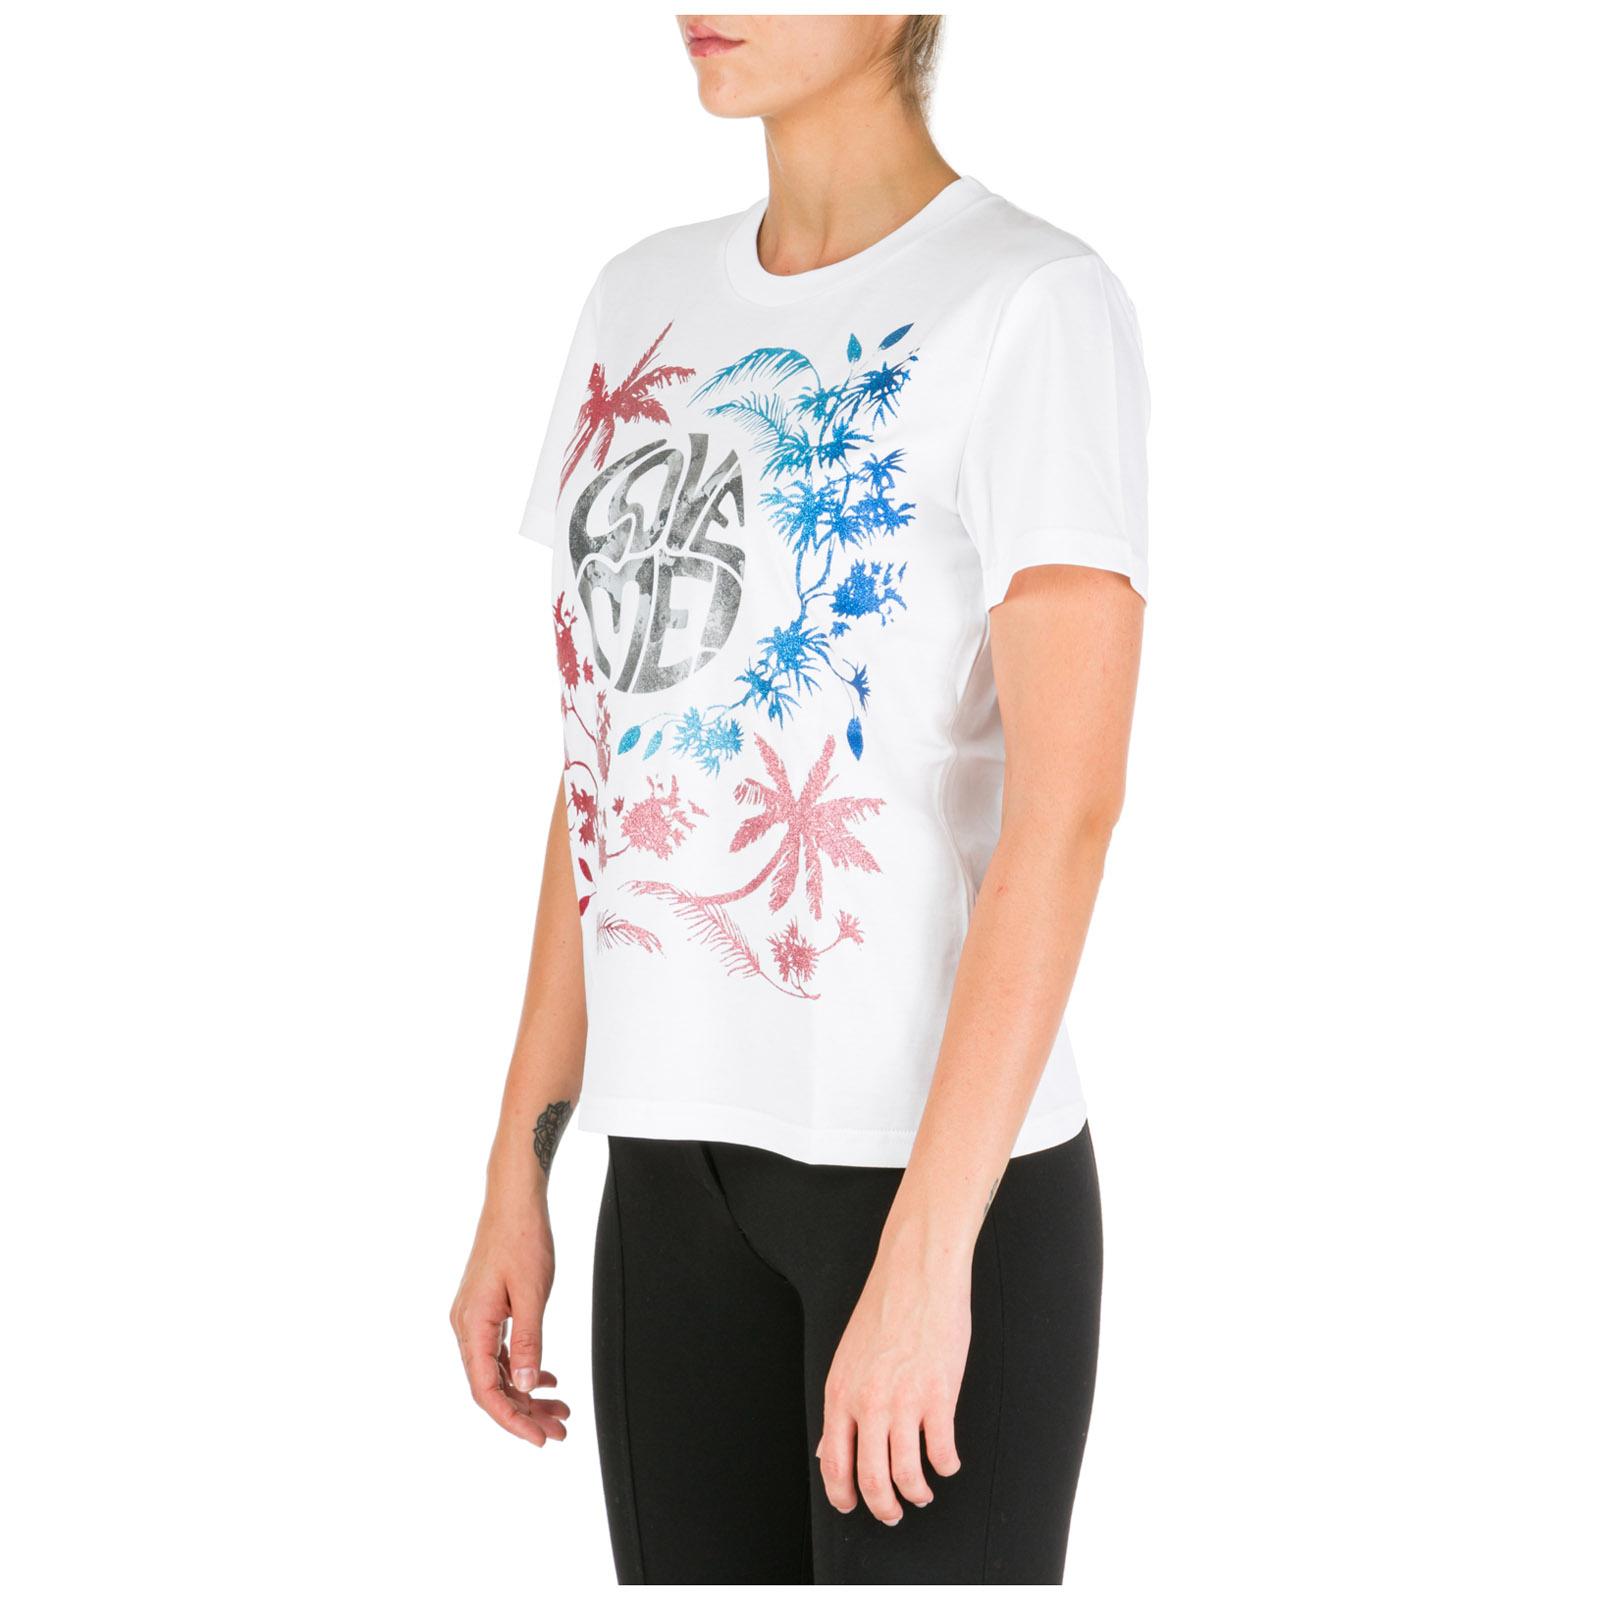 Women's t-shirt short sleeve crew neck round love me wild